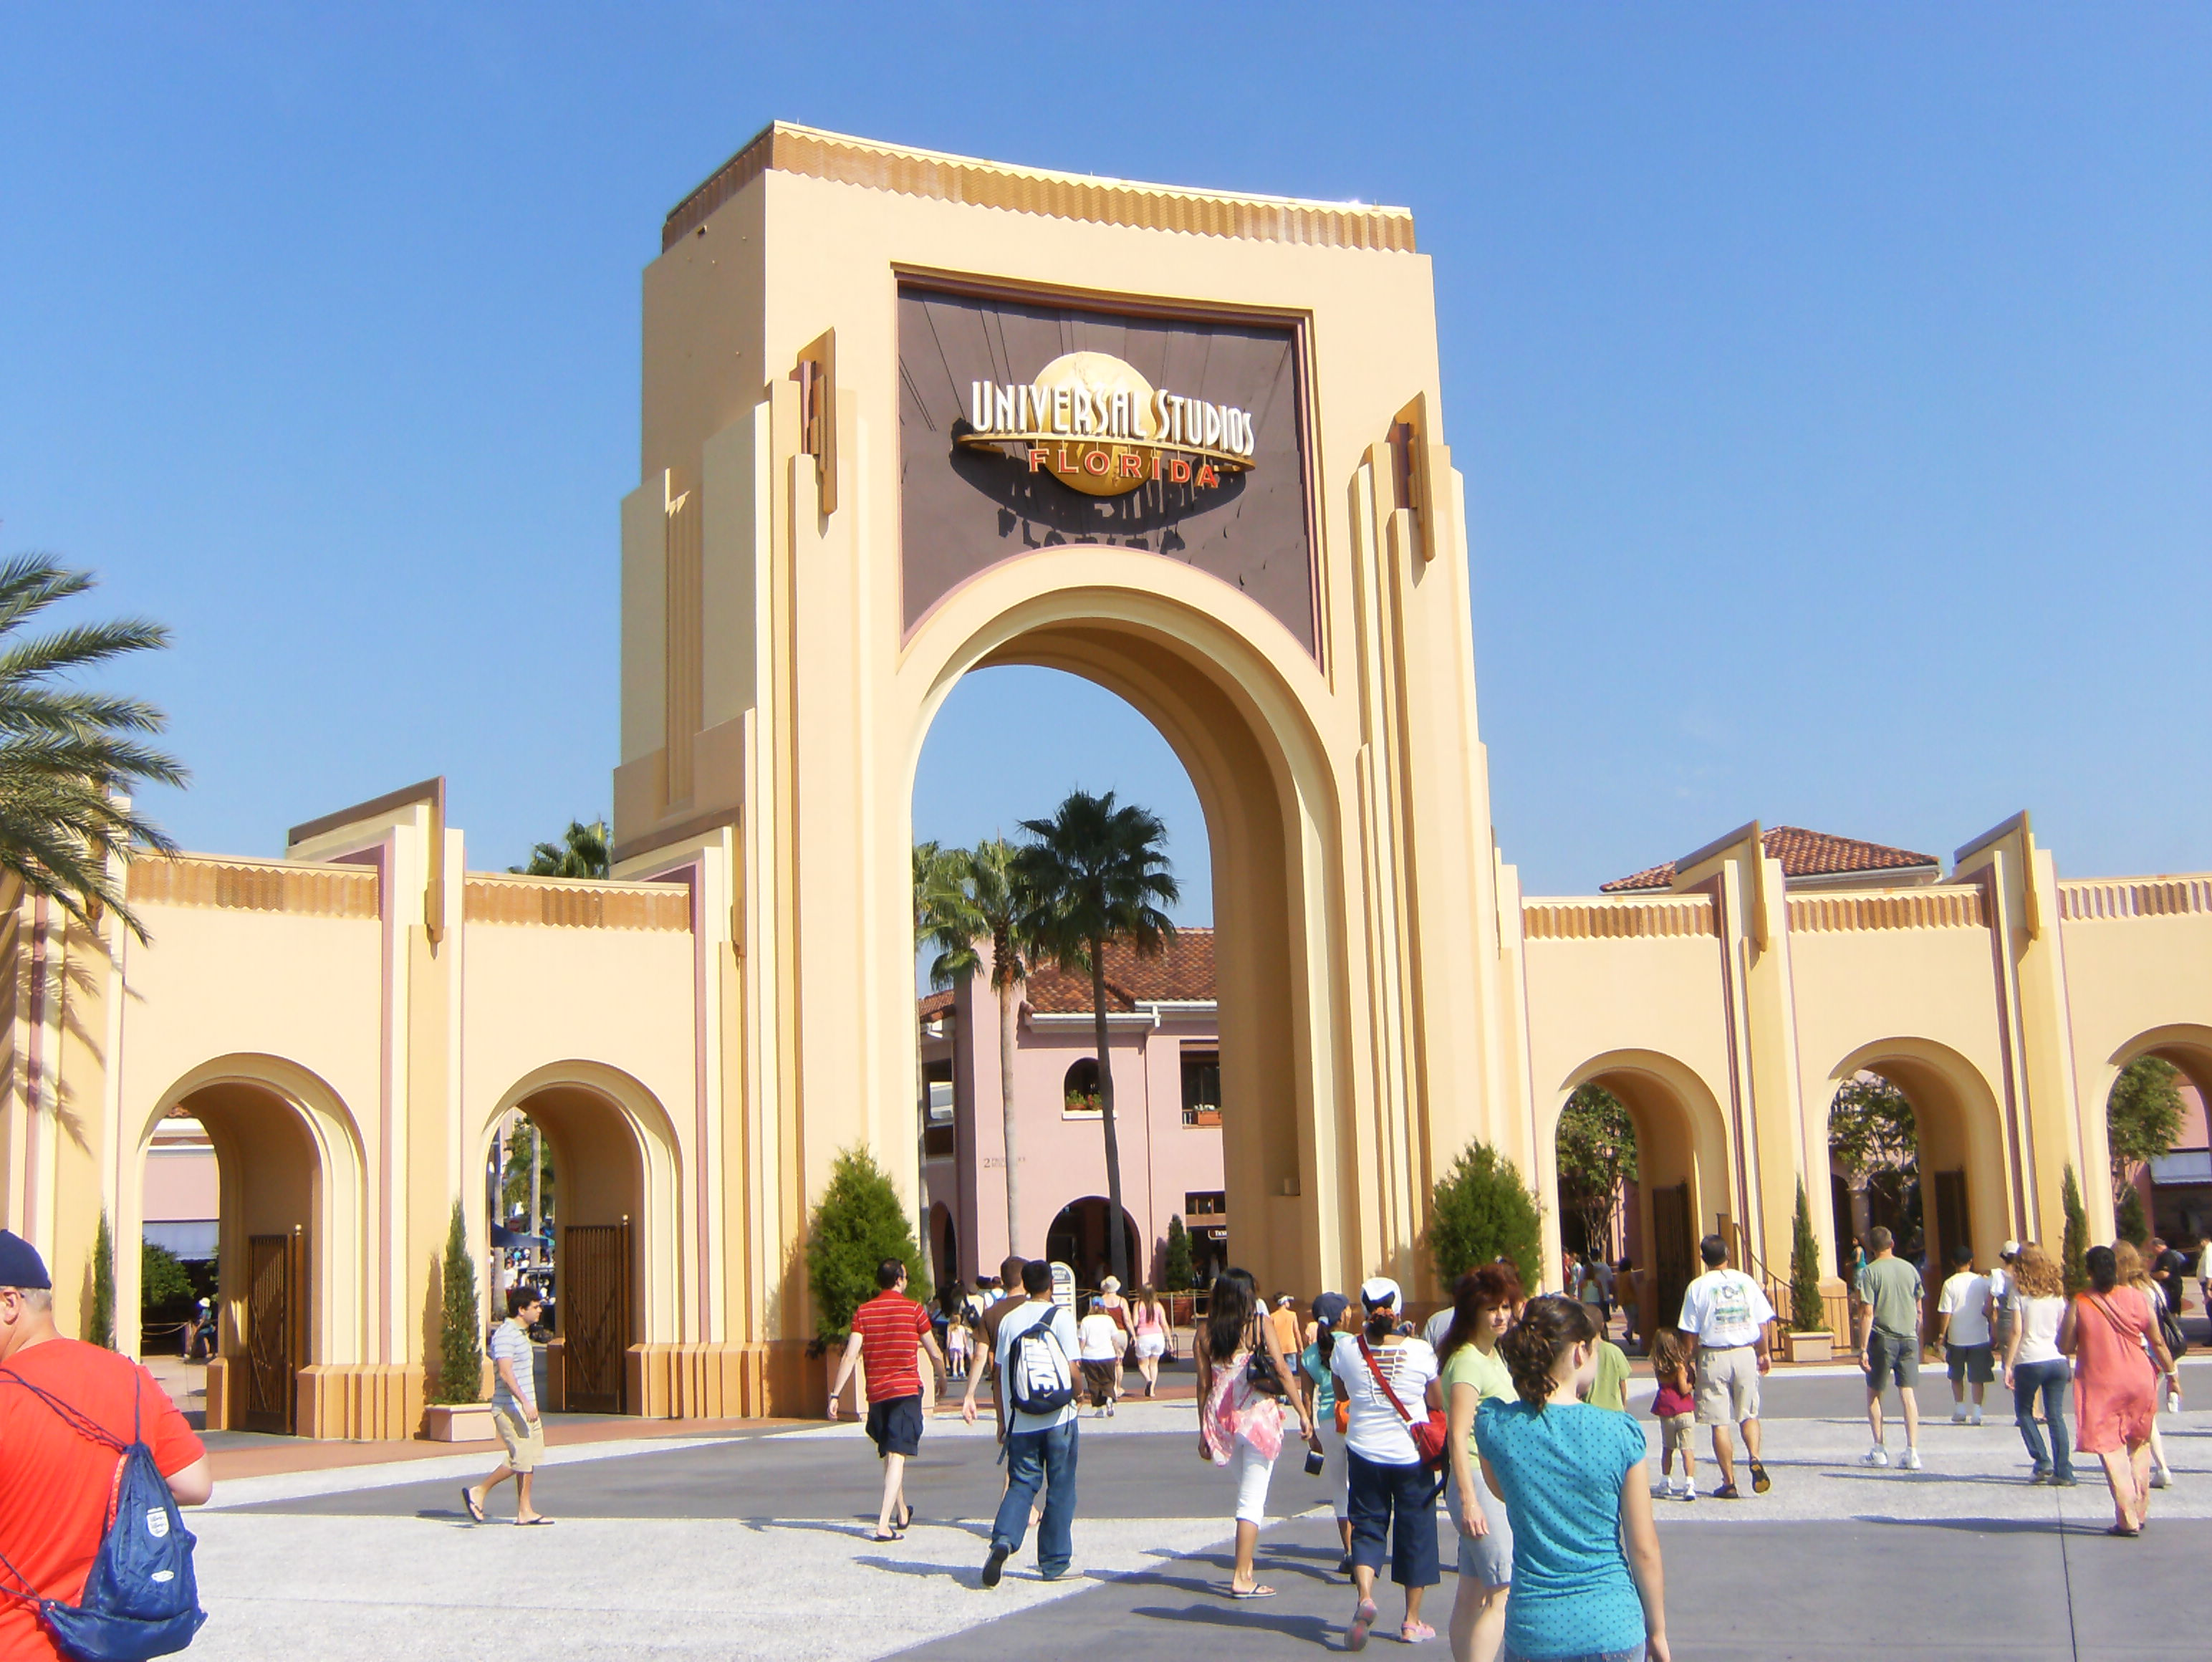 Universal Studios Florida Gate.JPG